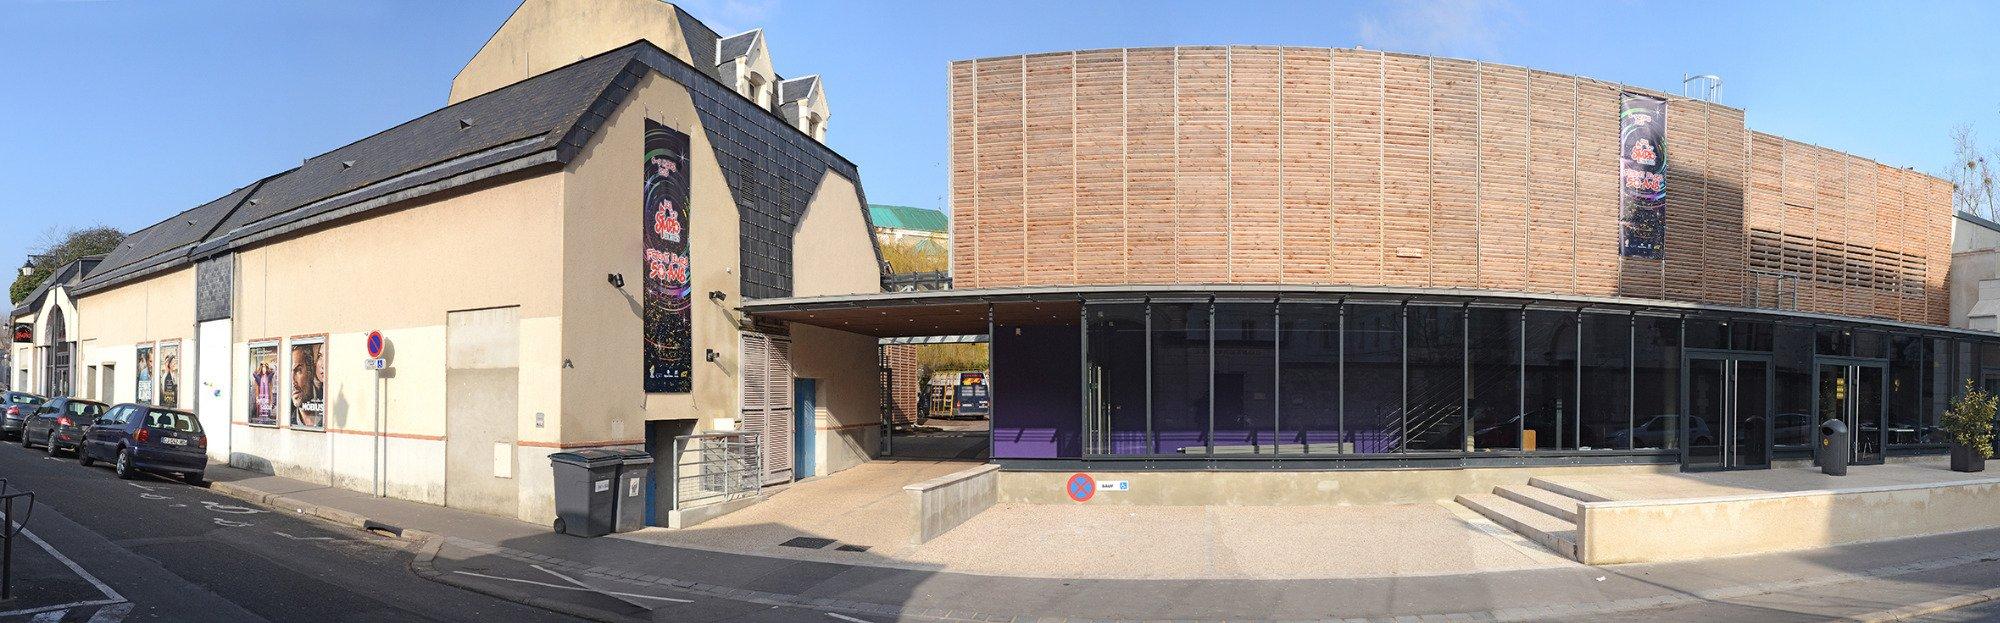 Cinemas Studio